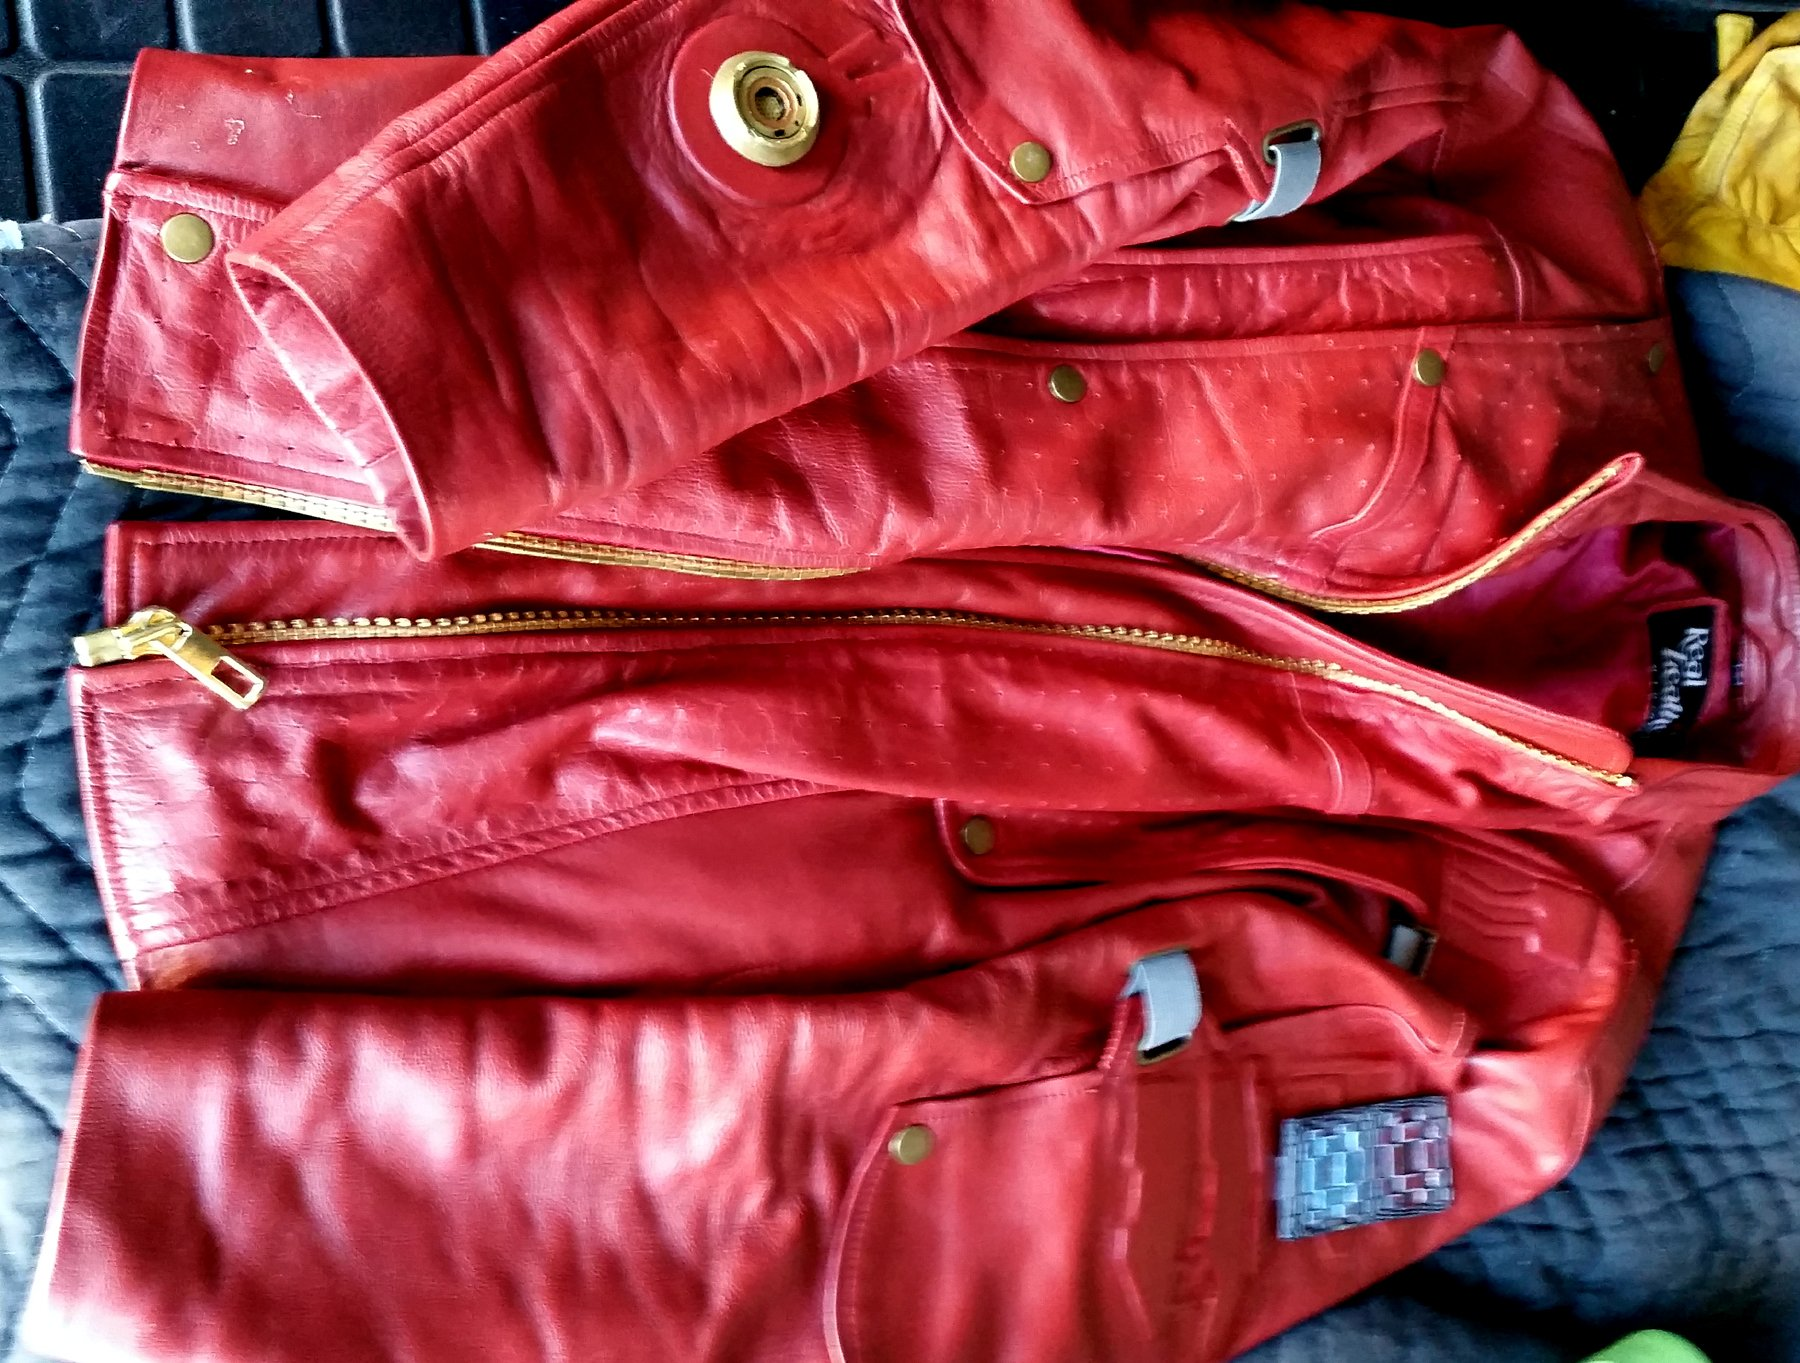 Jacket Valve and patch.jpg